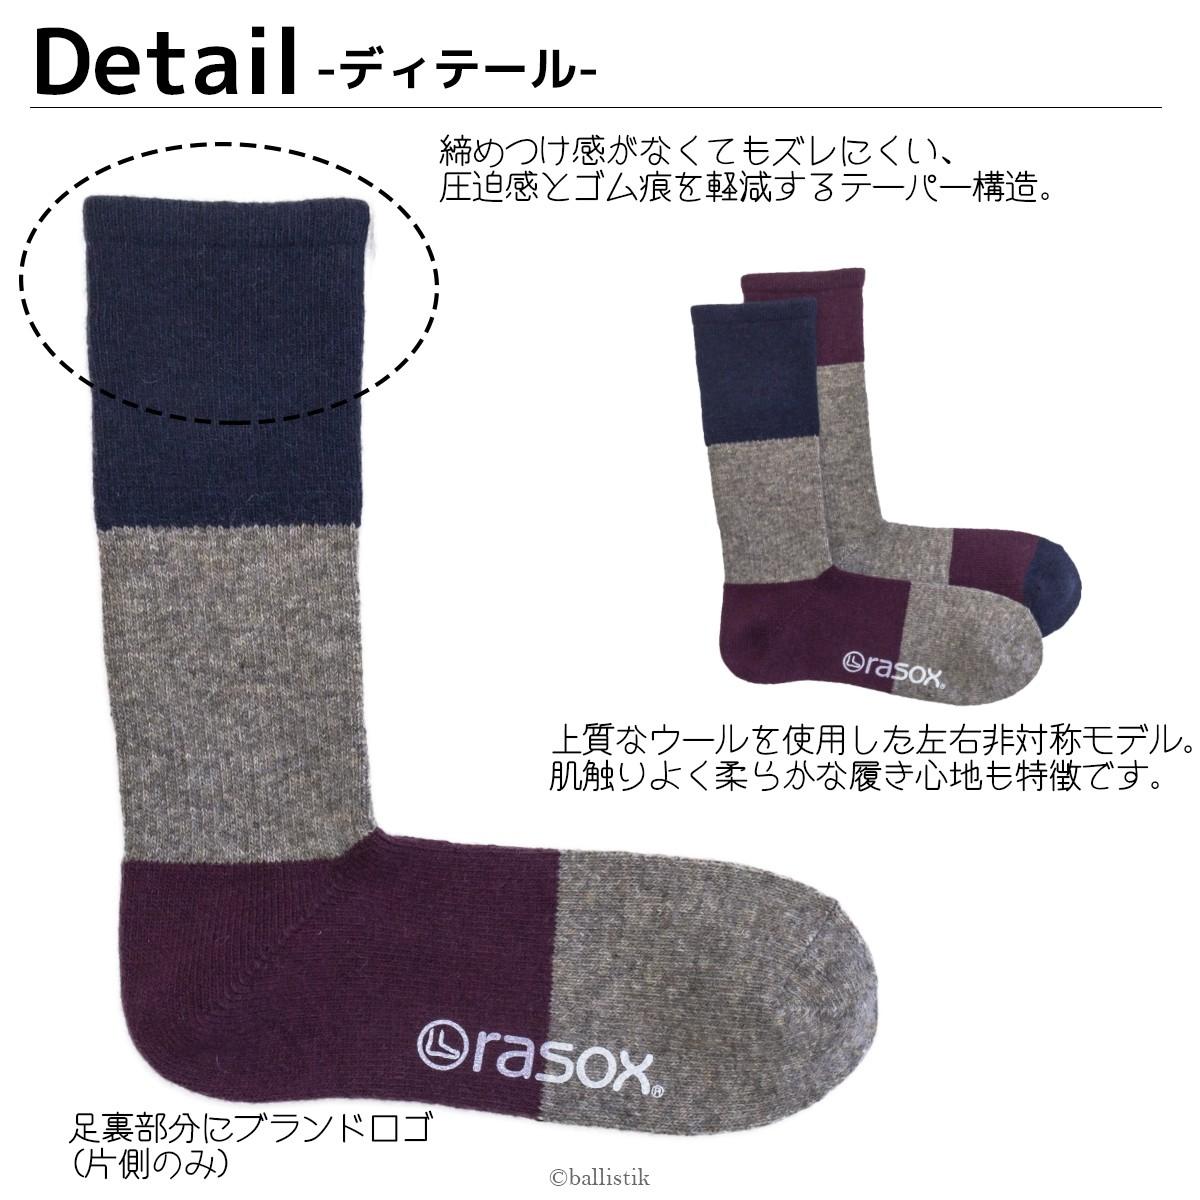 rasox/ラソックス/靴下/ウールソックス/クルーソックス/パネルミックス/カラー展開3